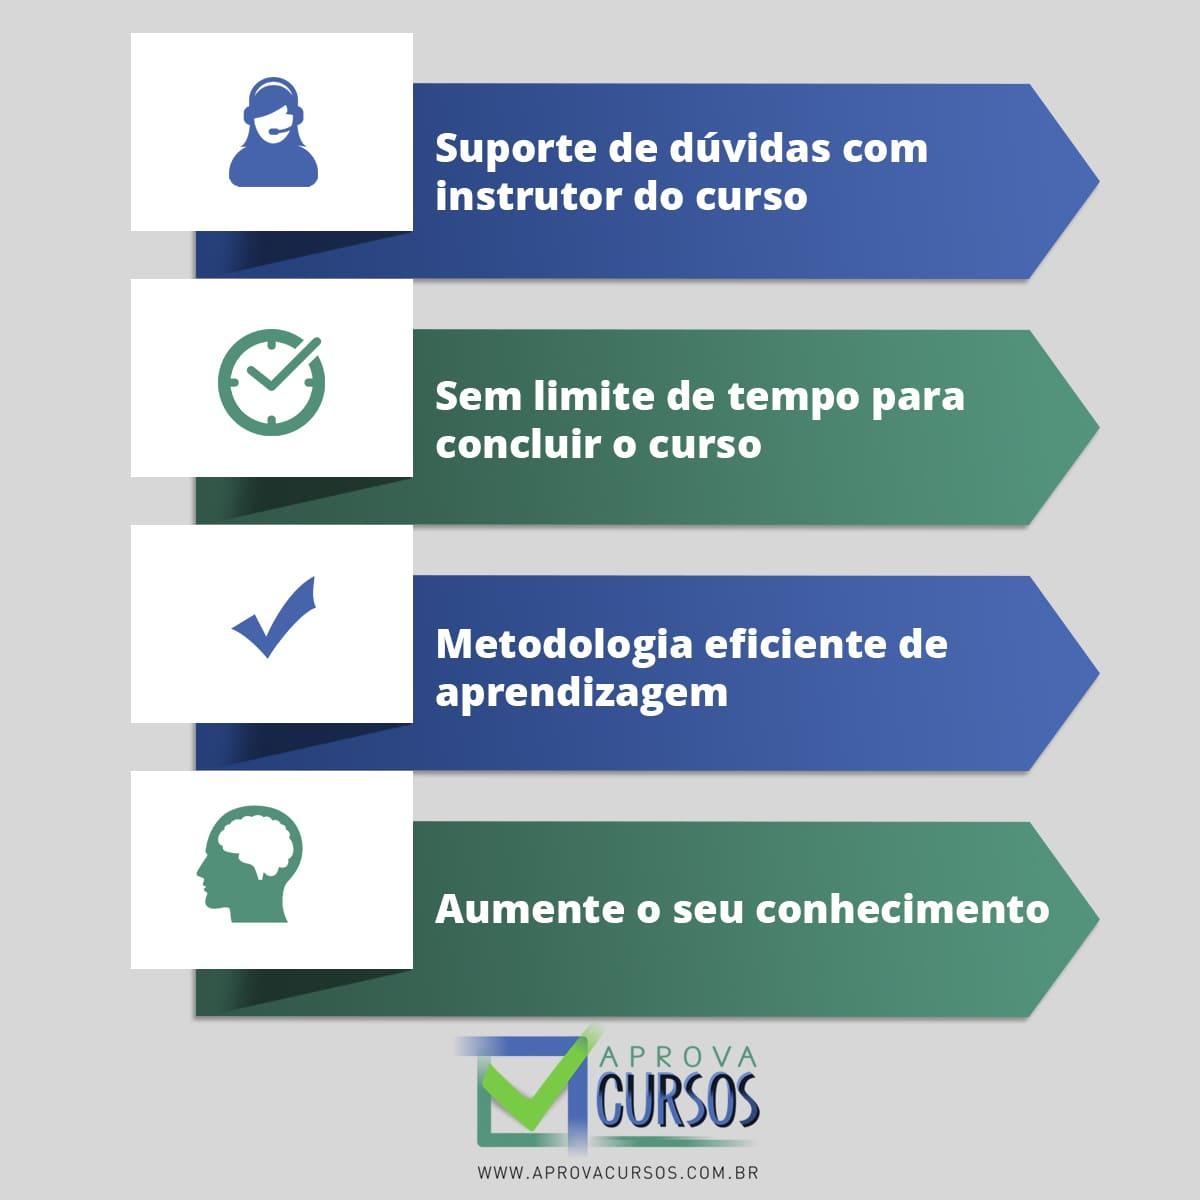 Curso Online de Psicologia Positiva Organizacional com Certificado  - Aprova Cursos